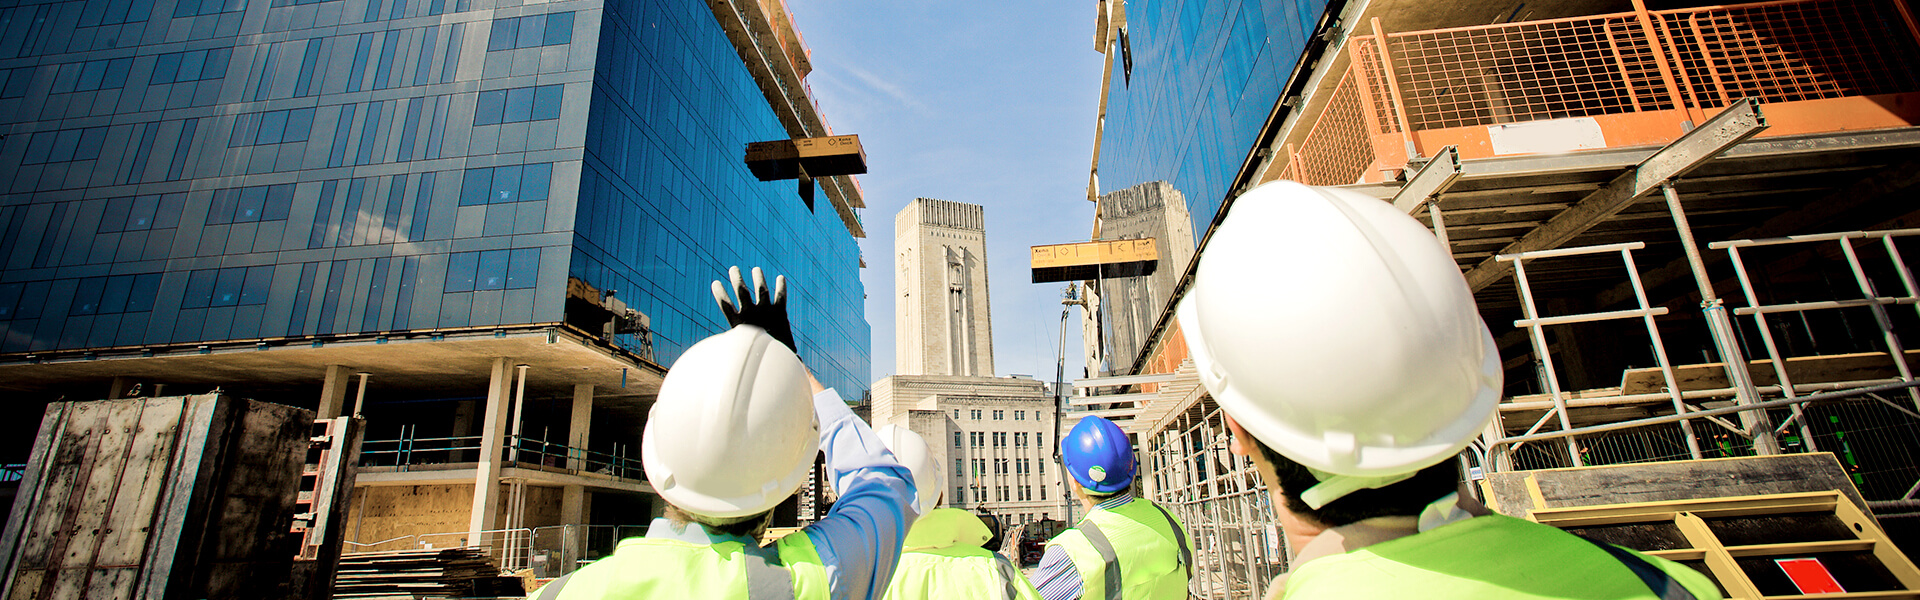 bulding construction